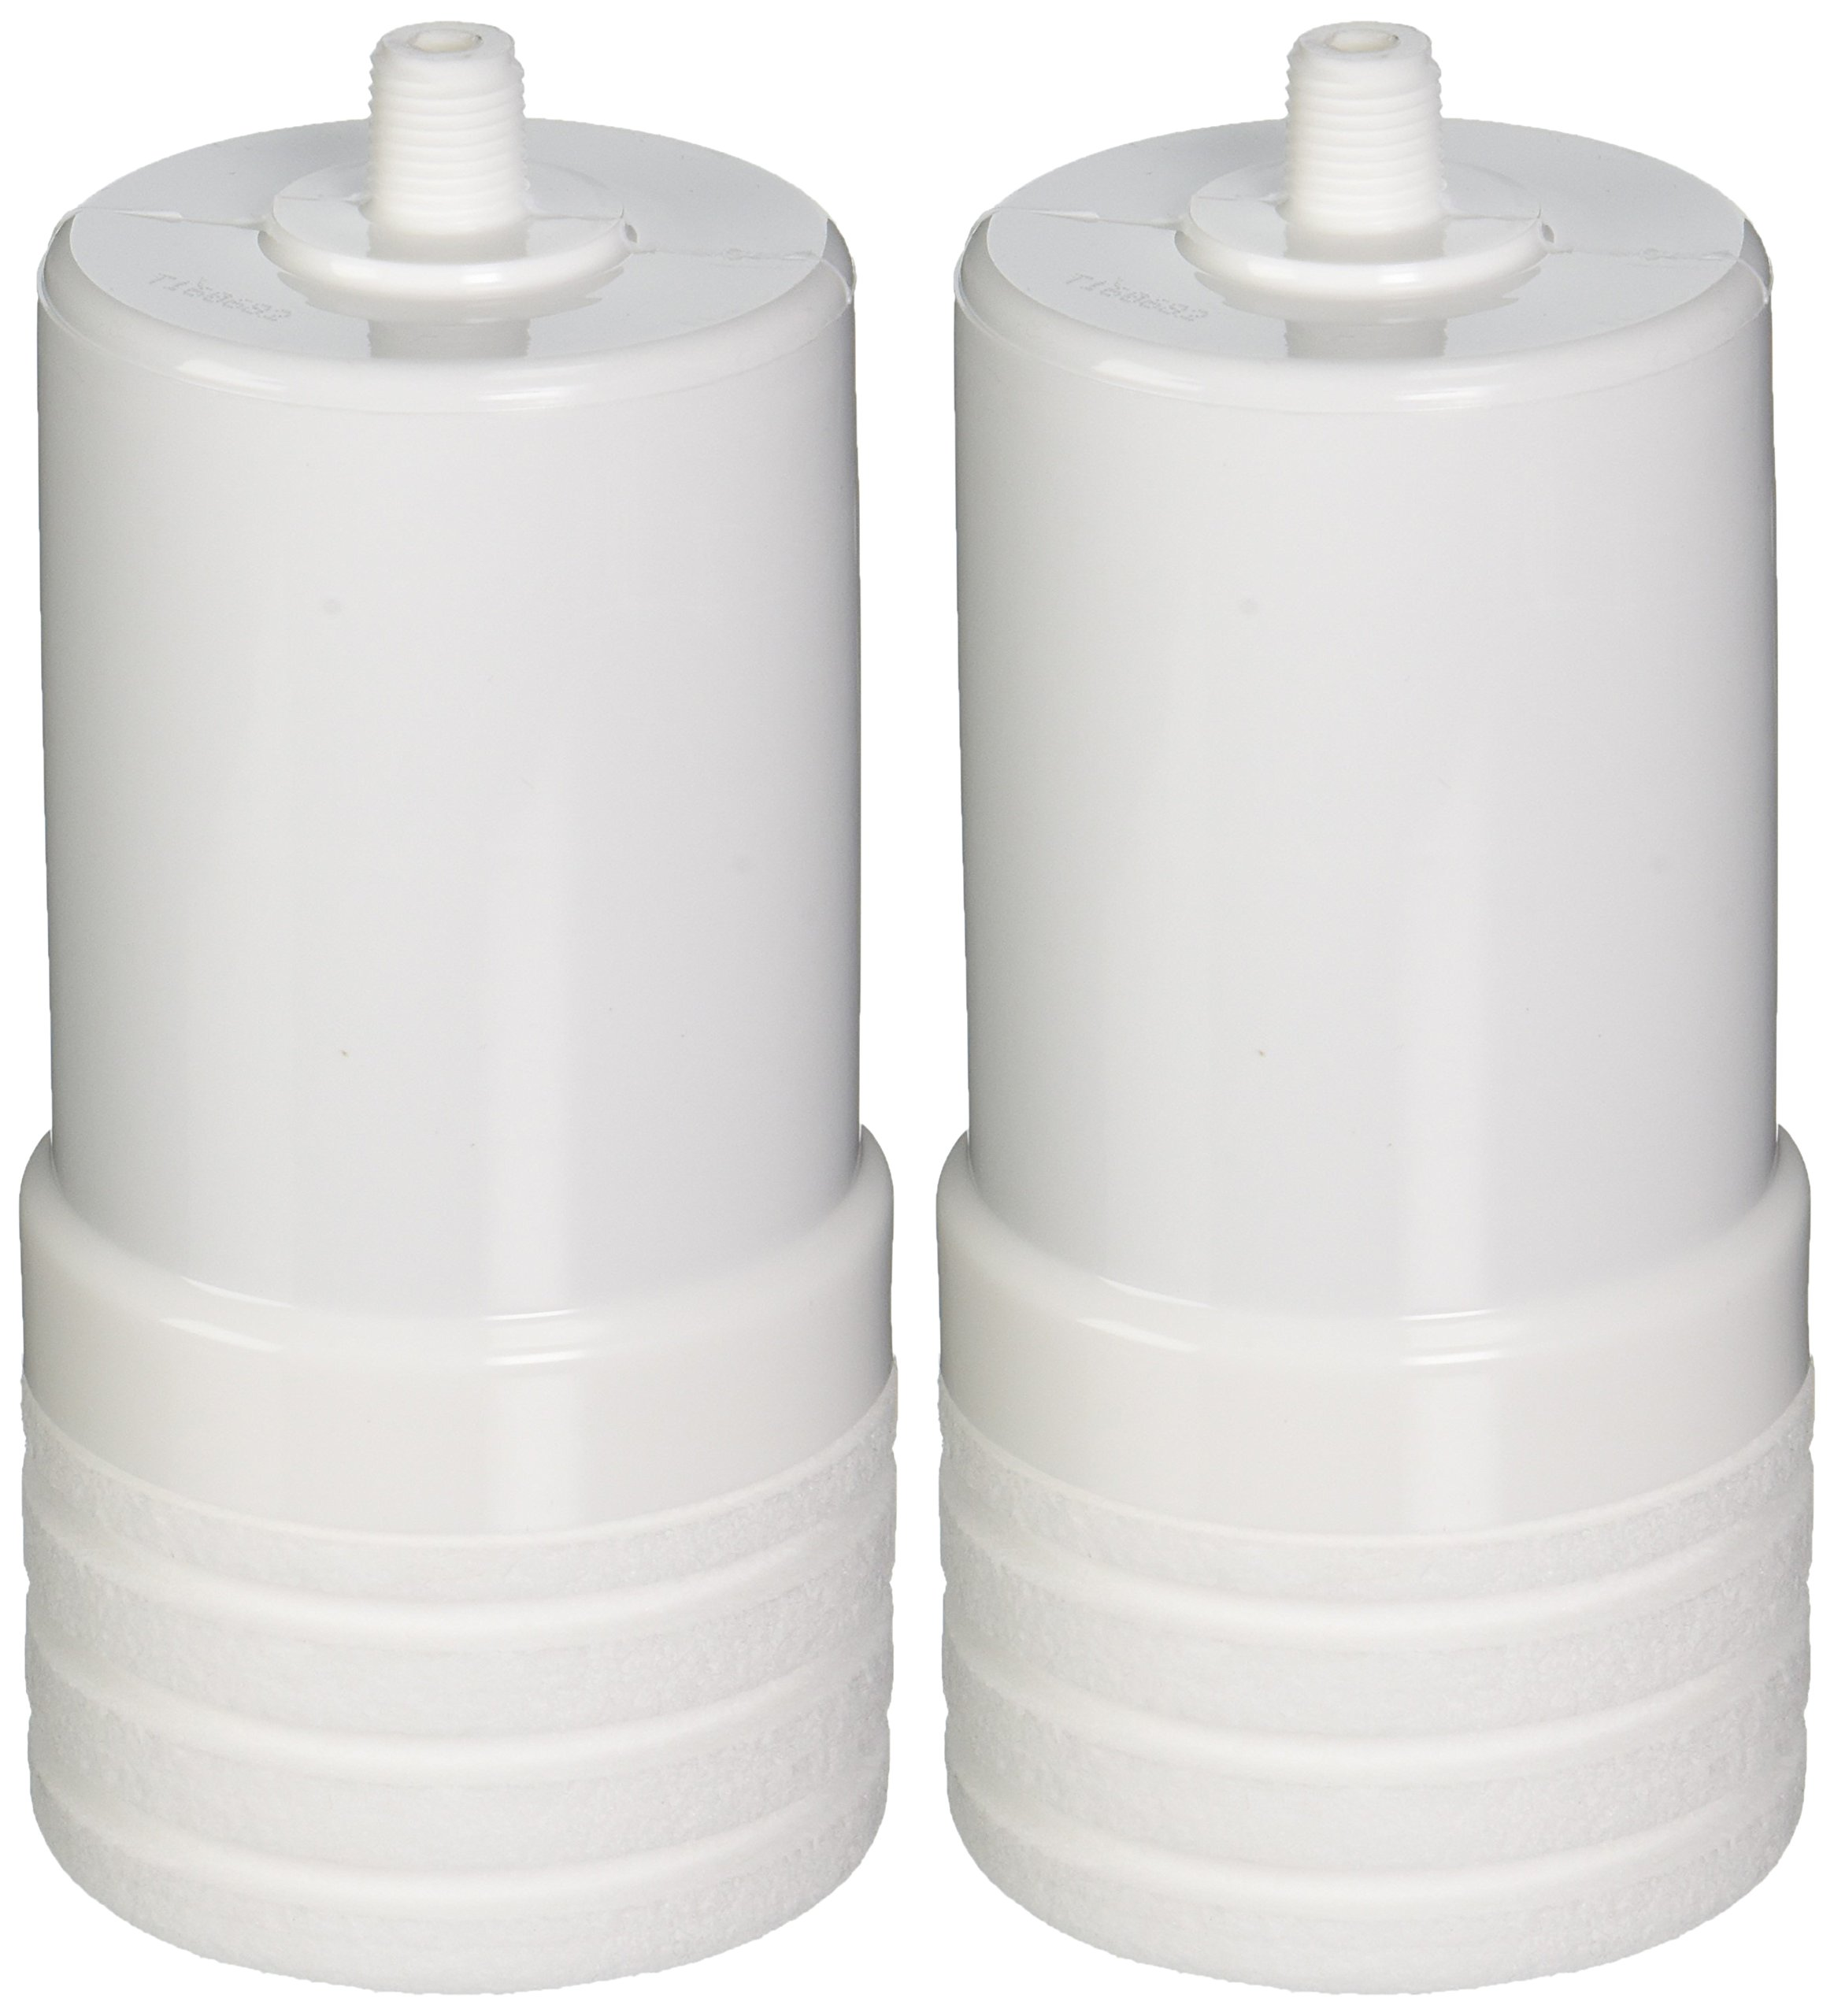 Aqua-Pure 70020318823 AP217 4629002 Under Sink Replacement Filter Cartridge (Pack of 2) by 3M Aqua-Pure